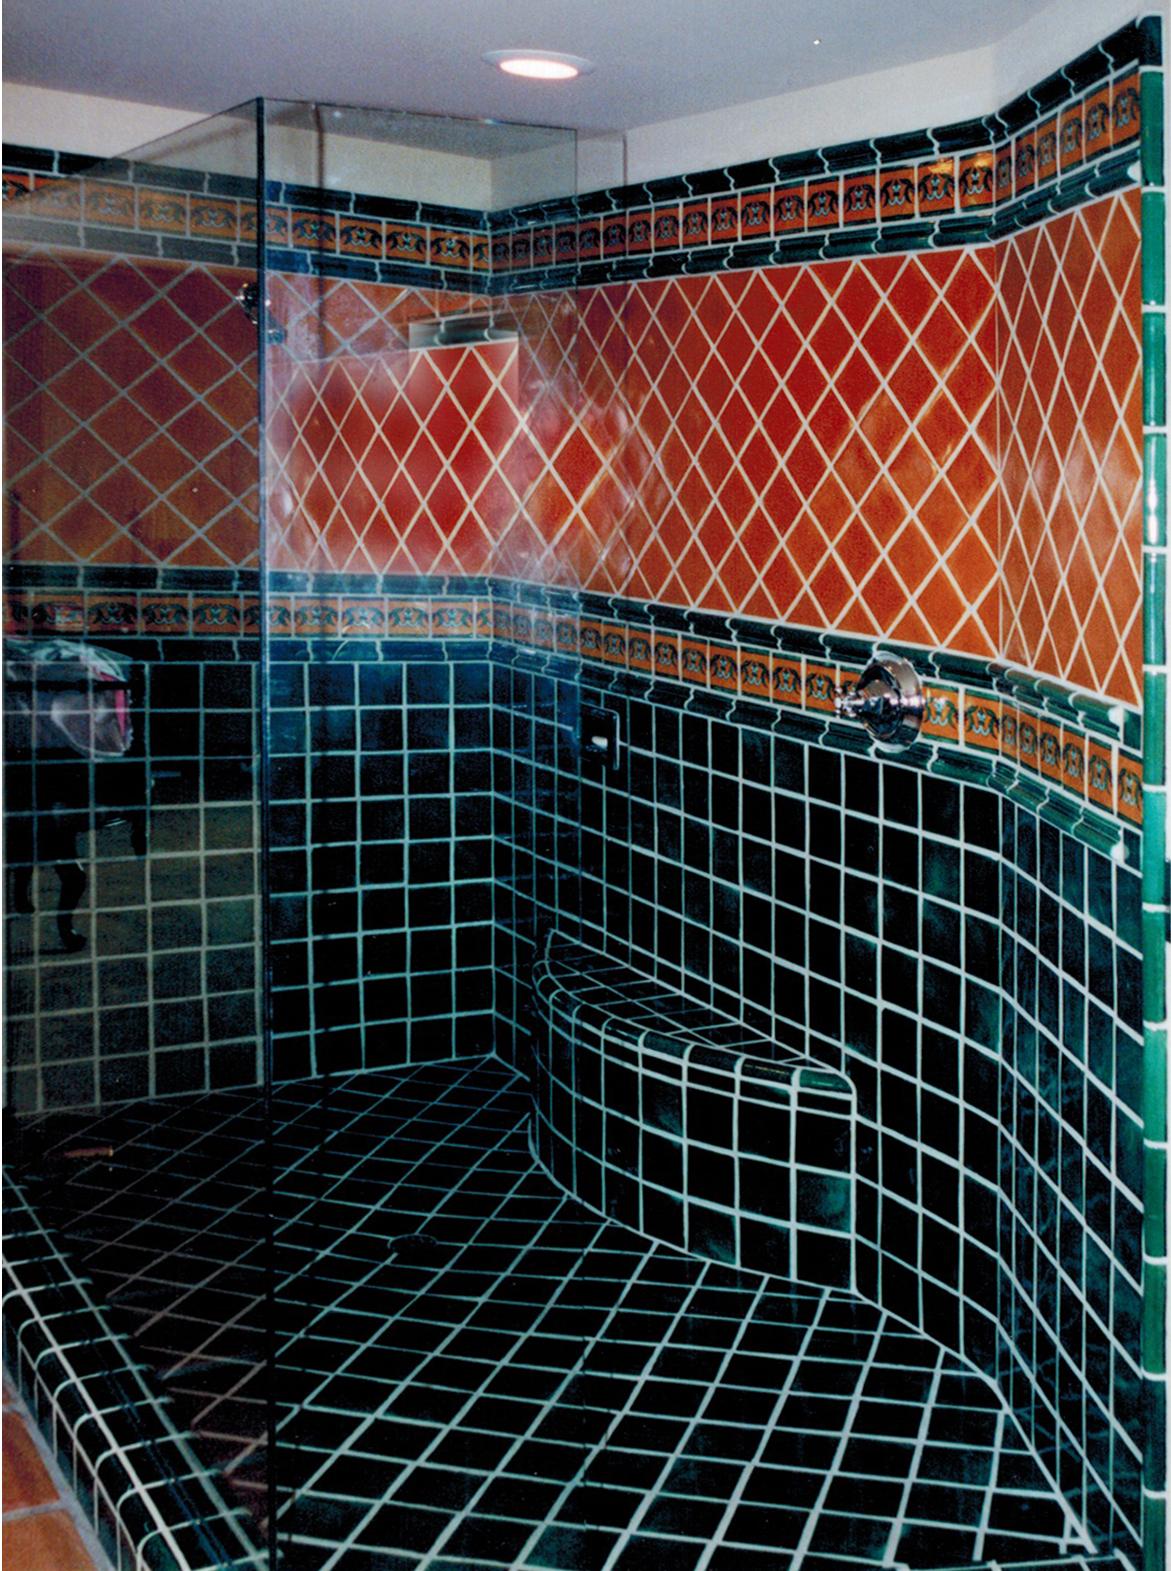 Bath 8b 4 x 4 Emerald, Caramel, Fluer di